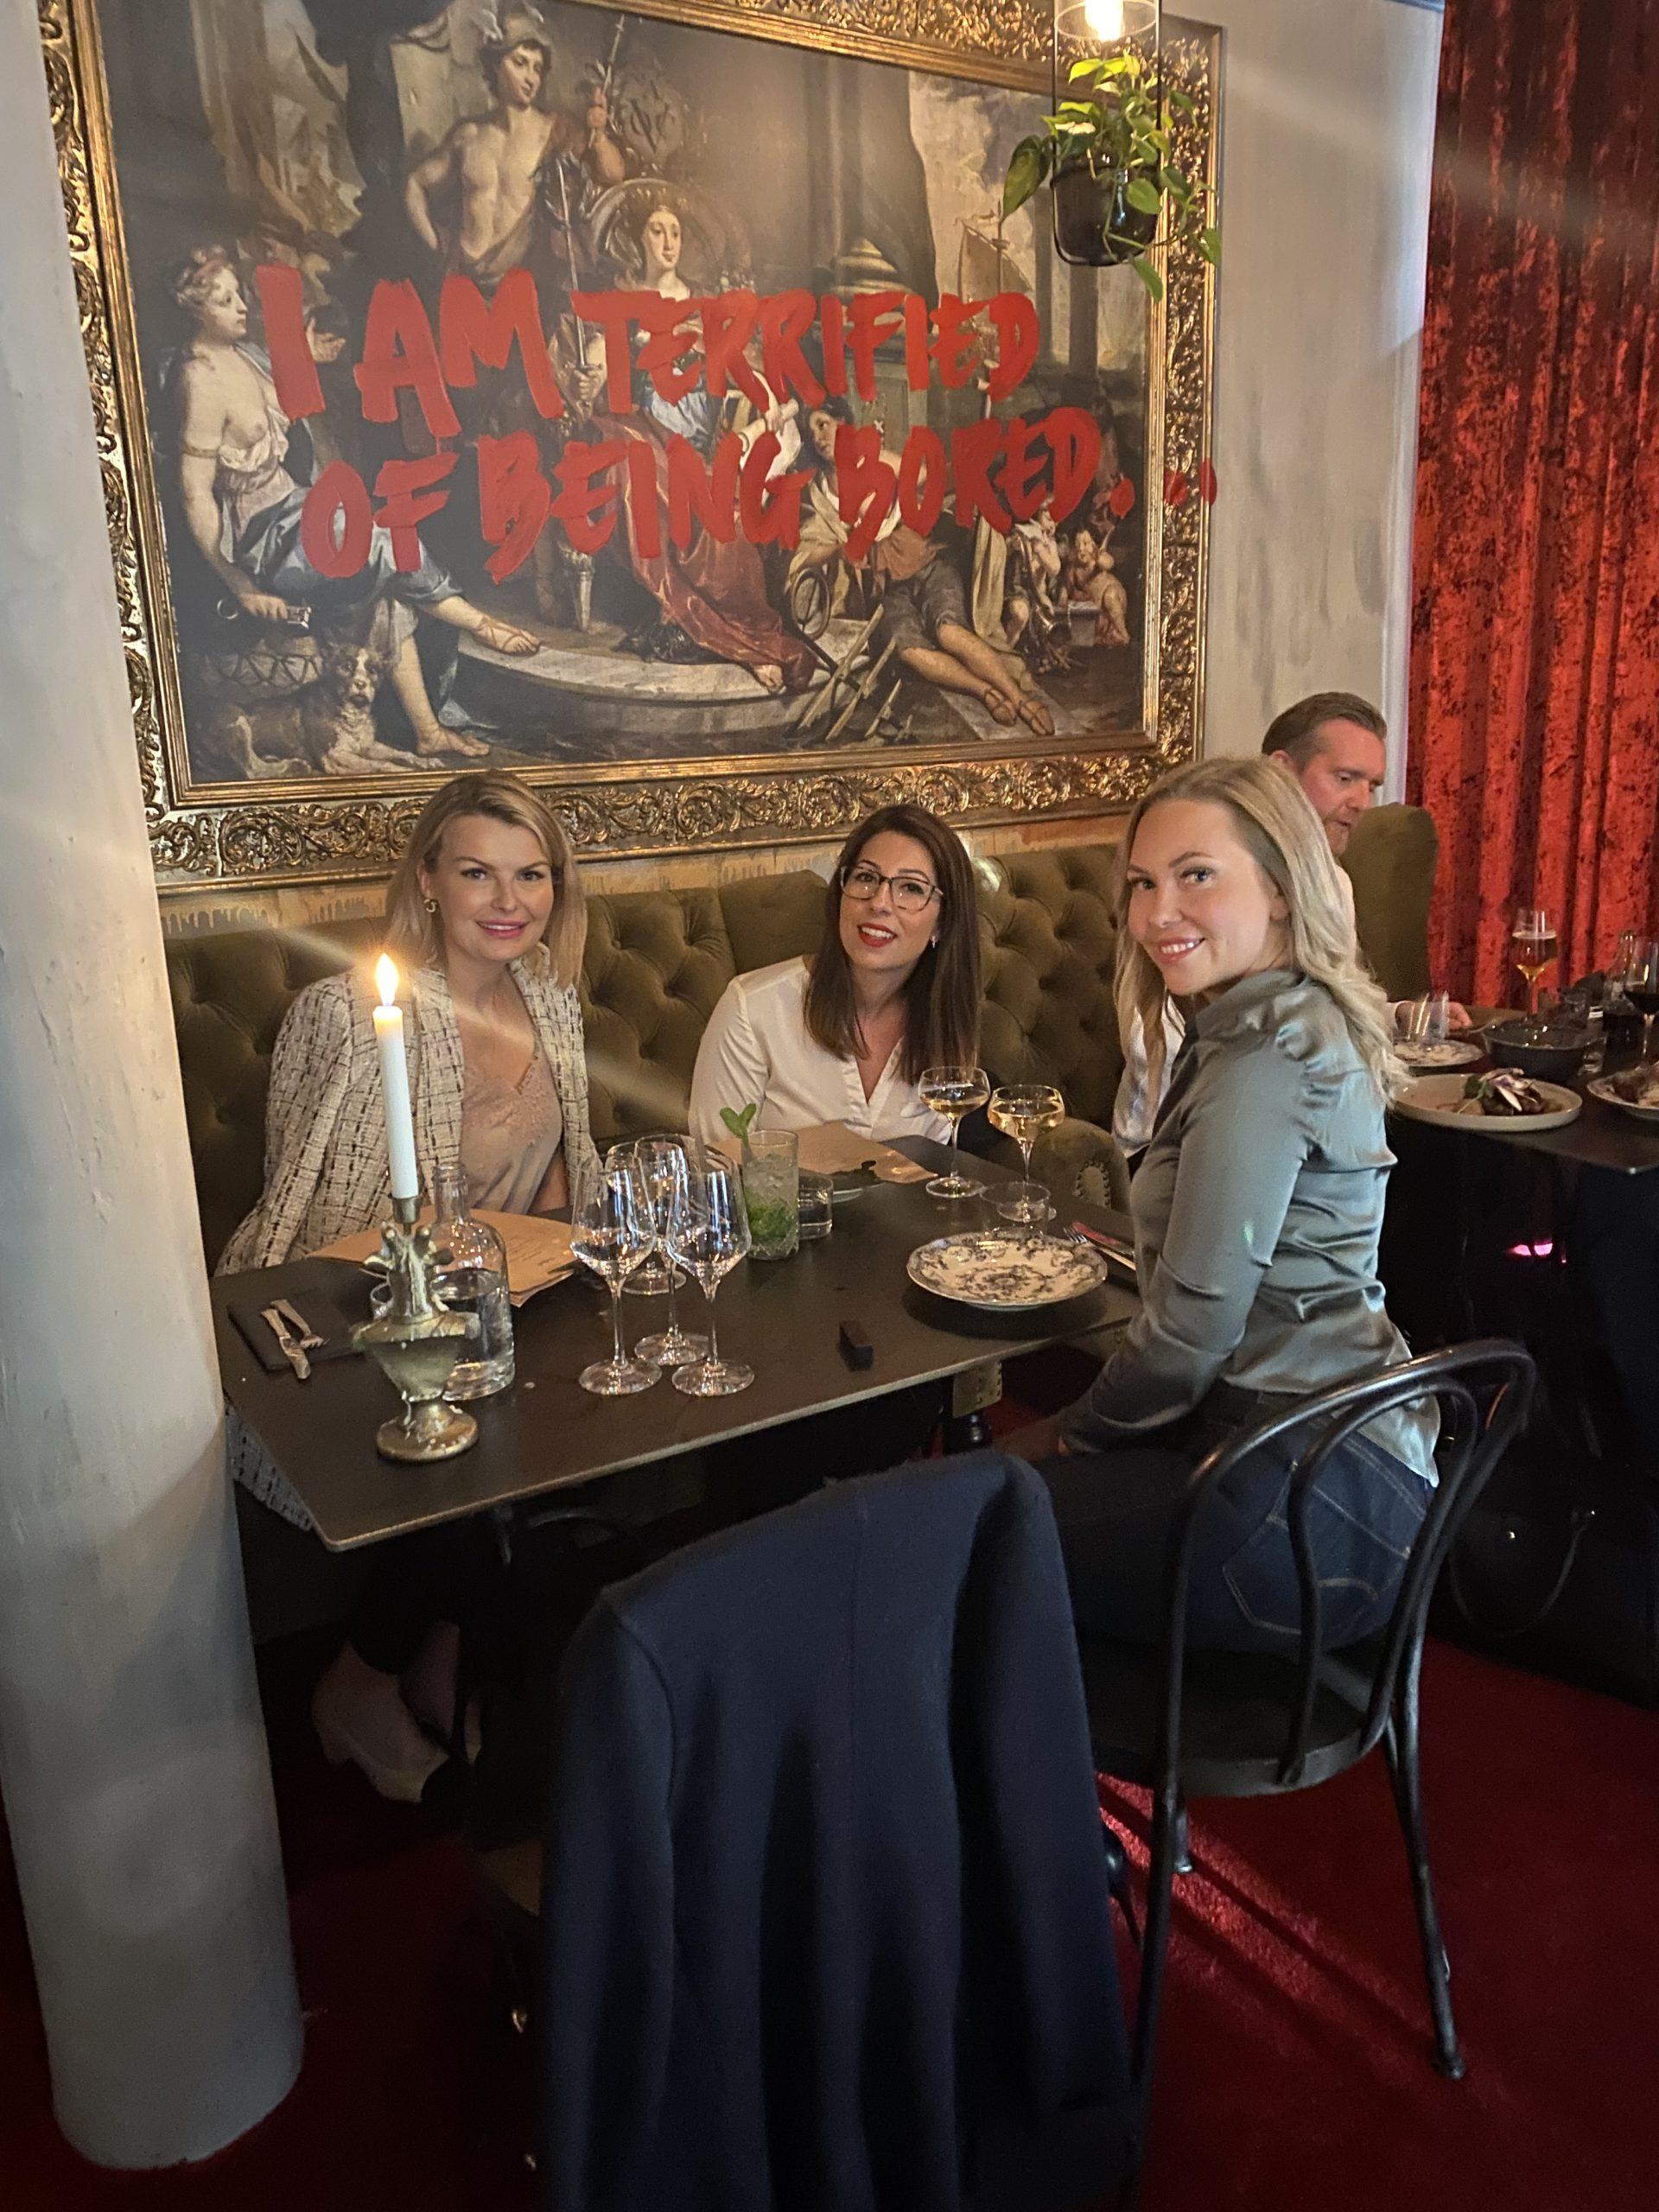 Middag med tjejerna & söndagsmys 